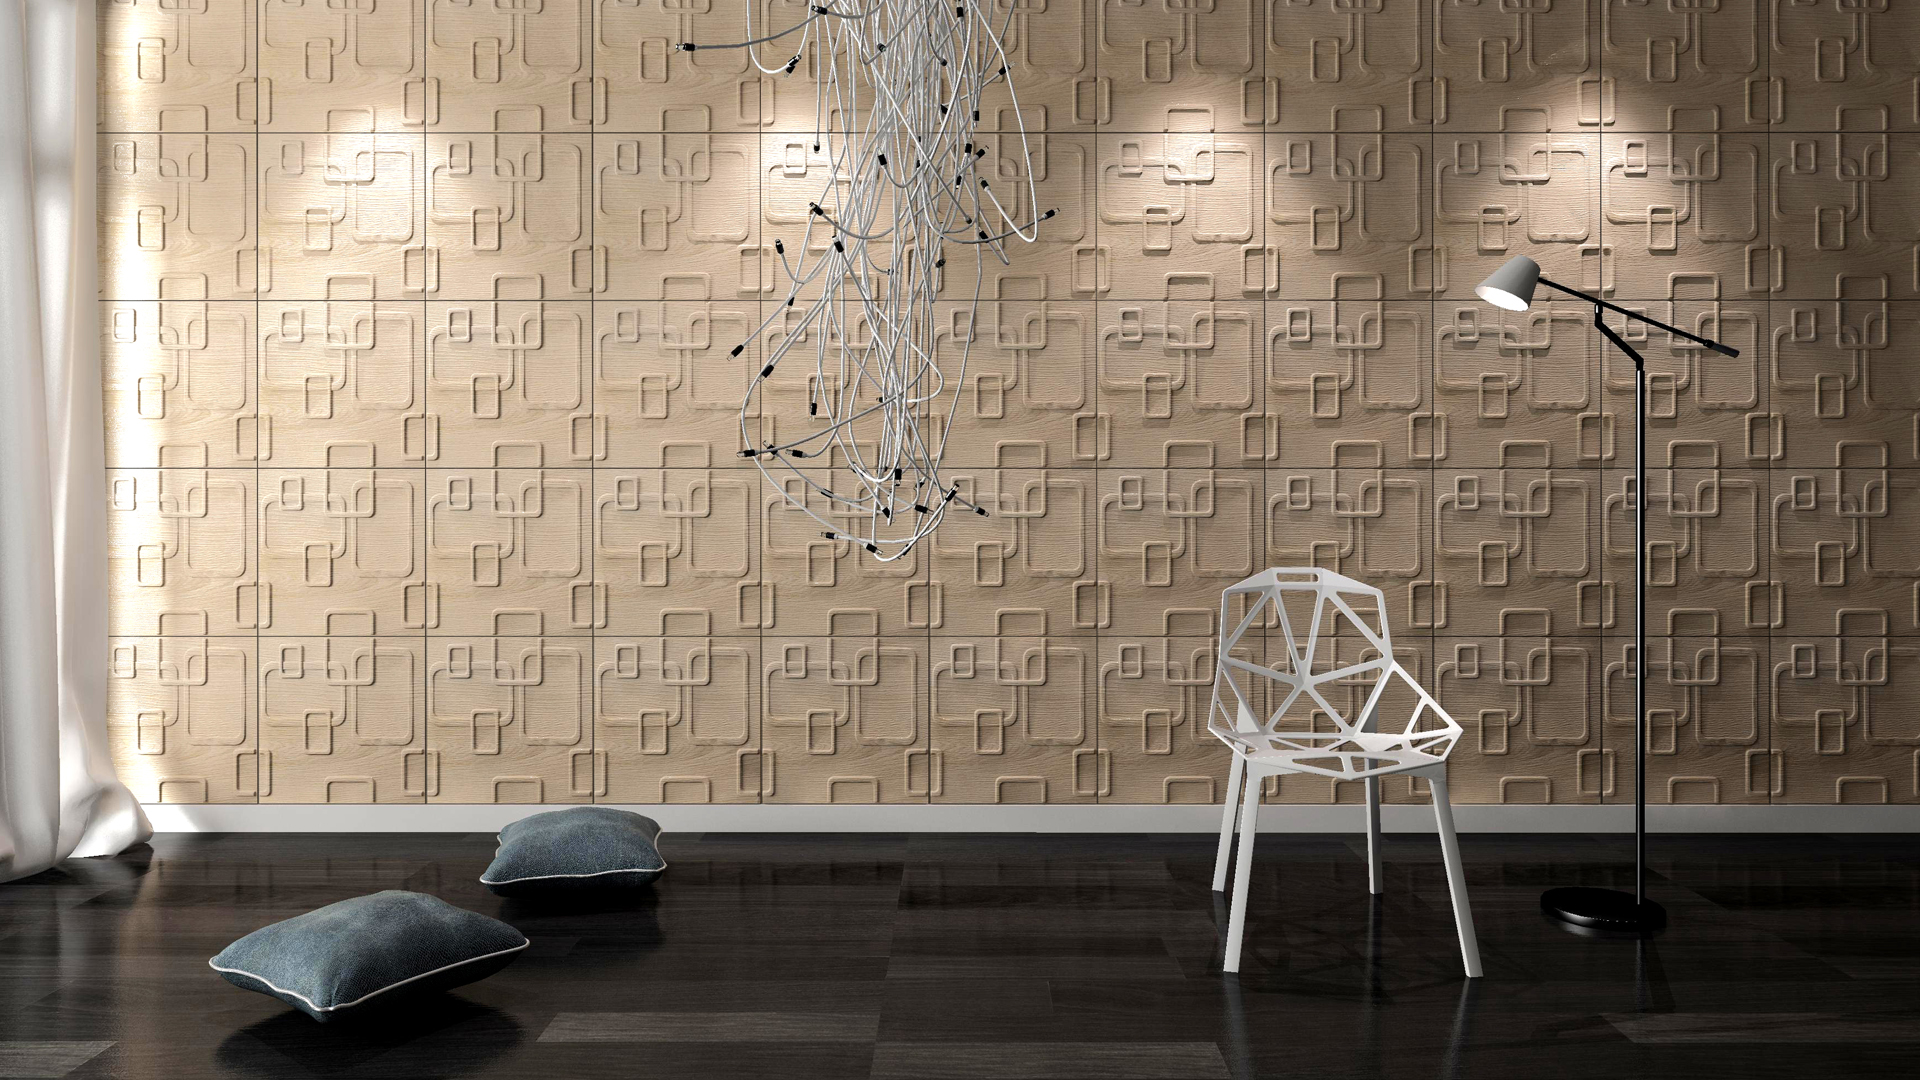 3D Wandpaneele - Produkte - Olina - Deckenpaneele - 3D Tapeten - Wandverkleidung